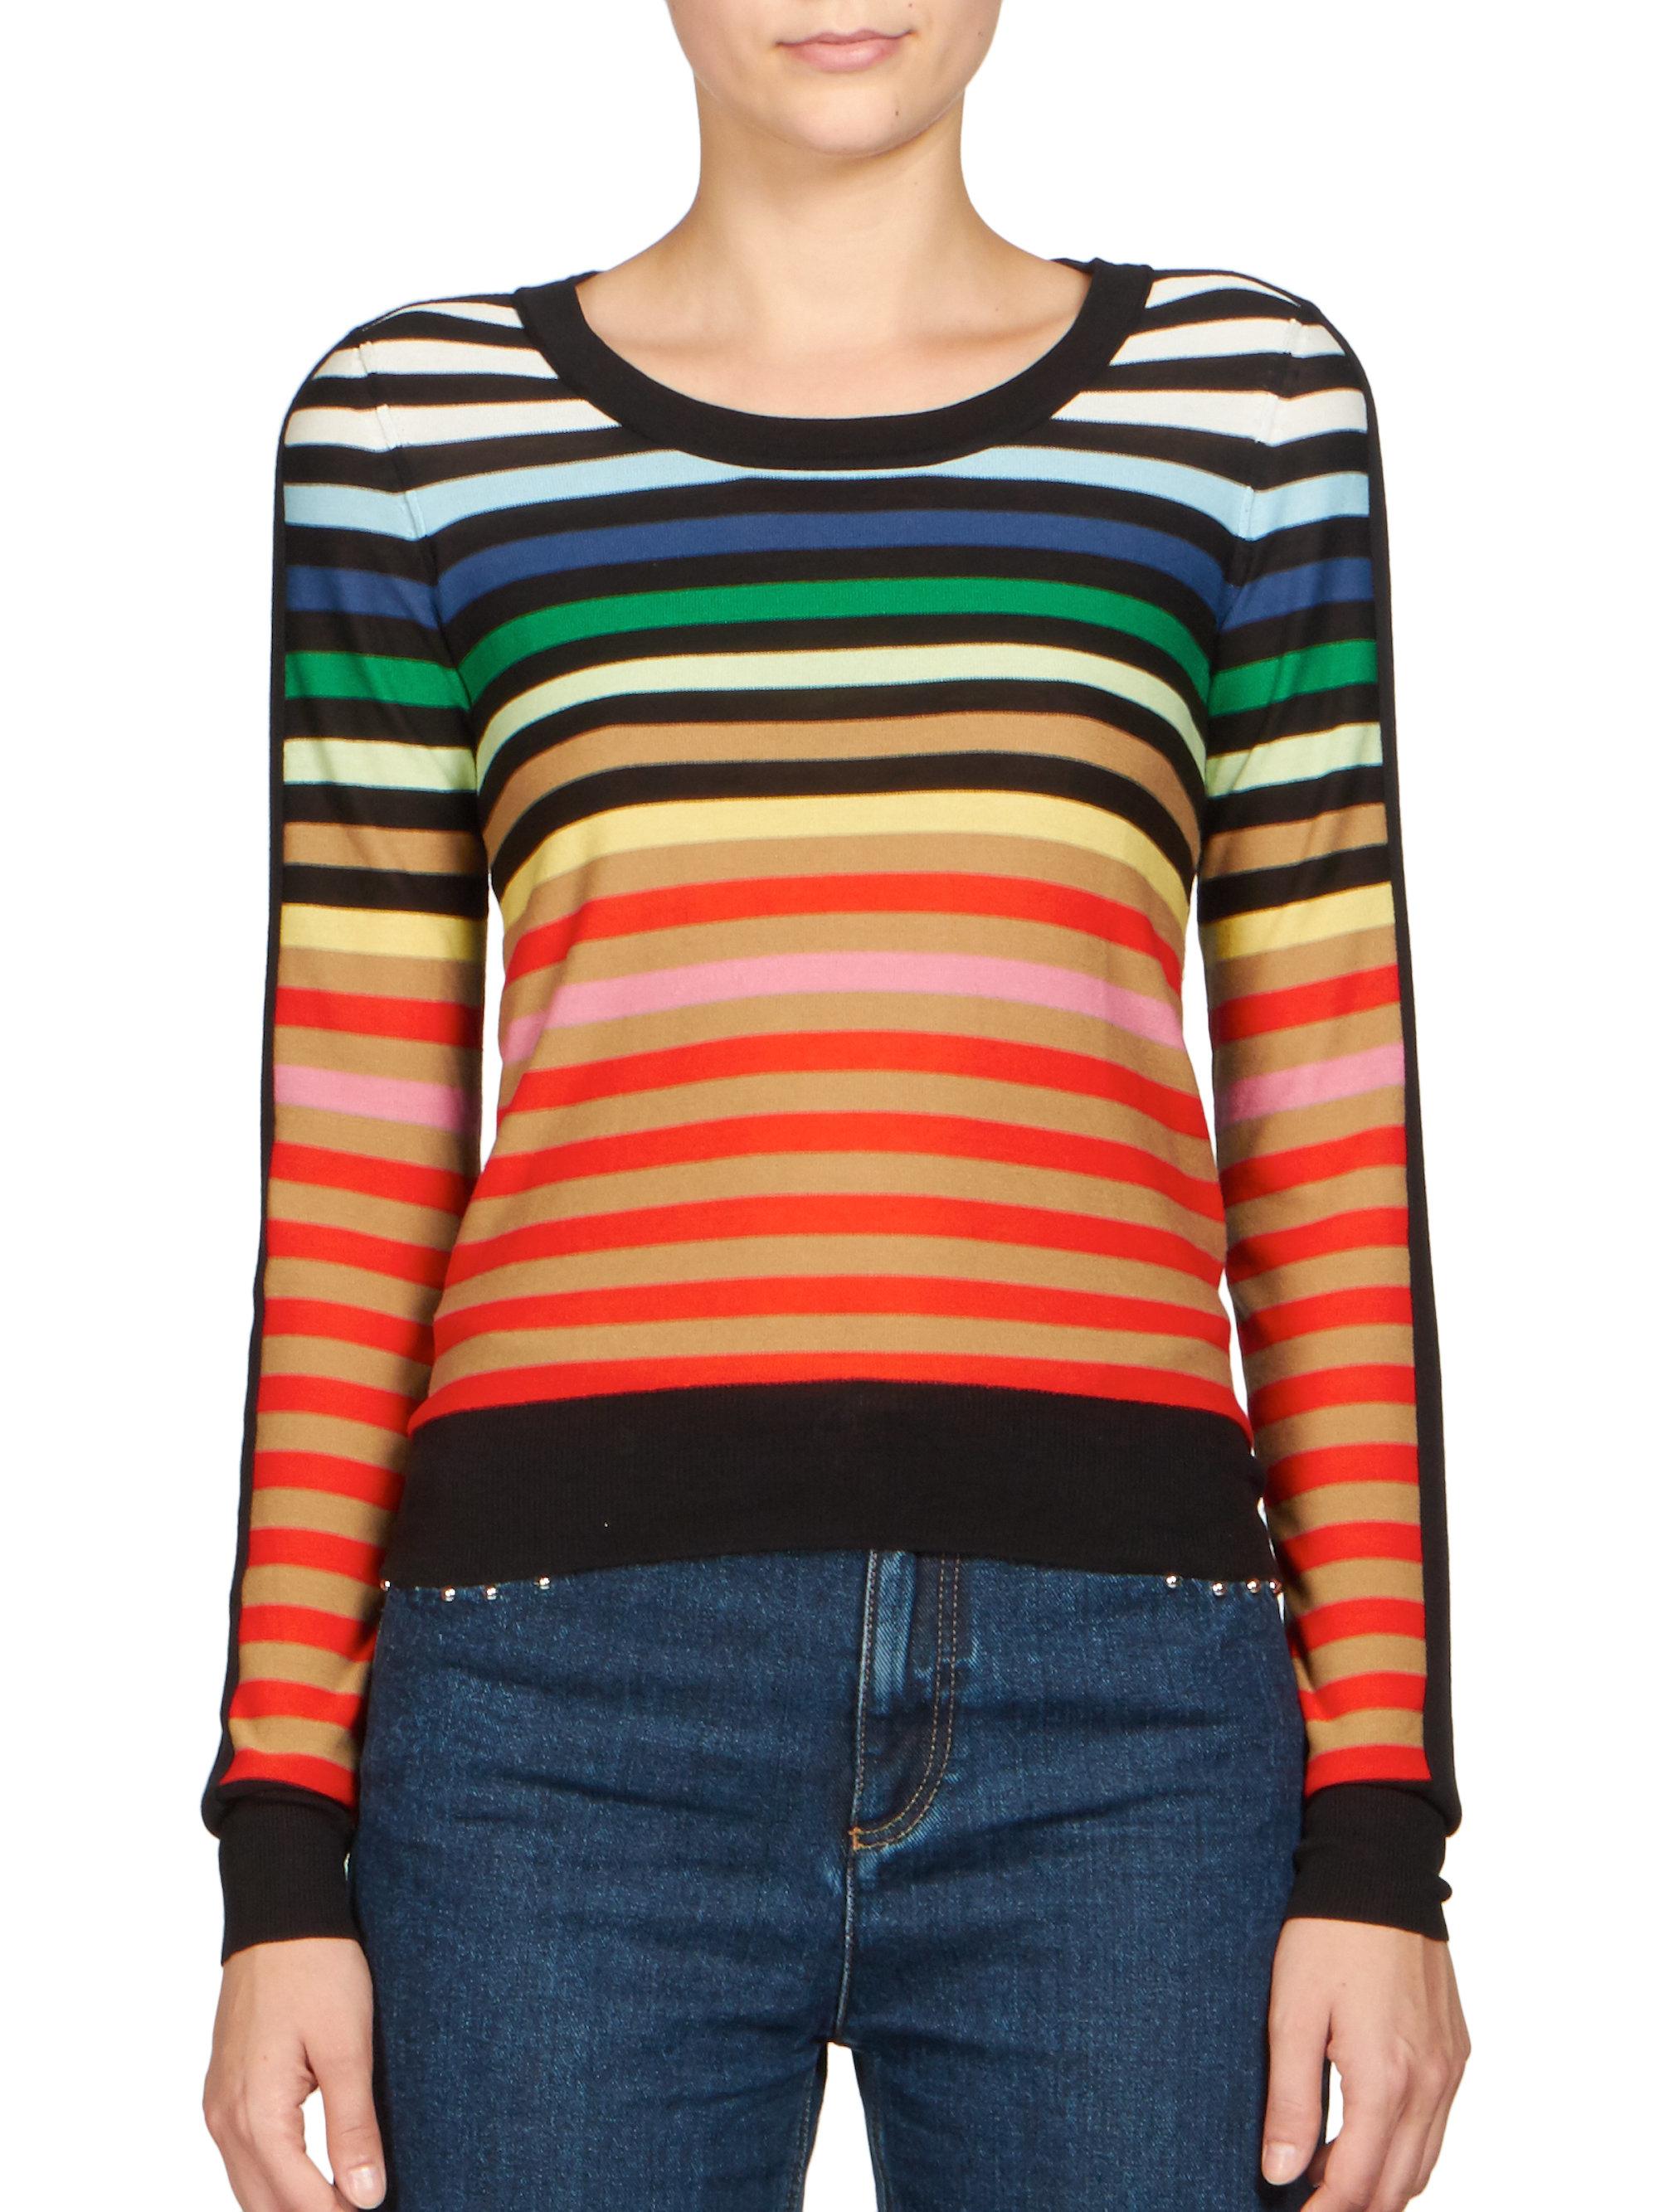 Sonia rykiel Silk & Cotton Multicolor-striped Sweater | Lyst